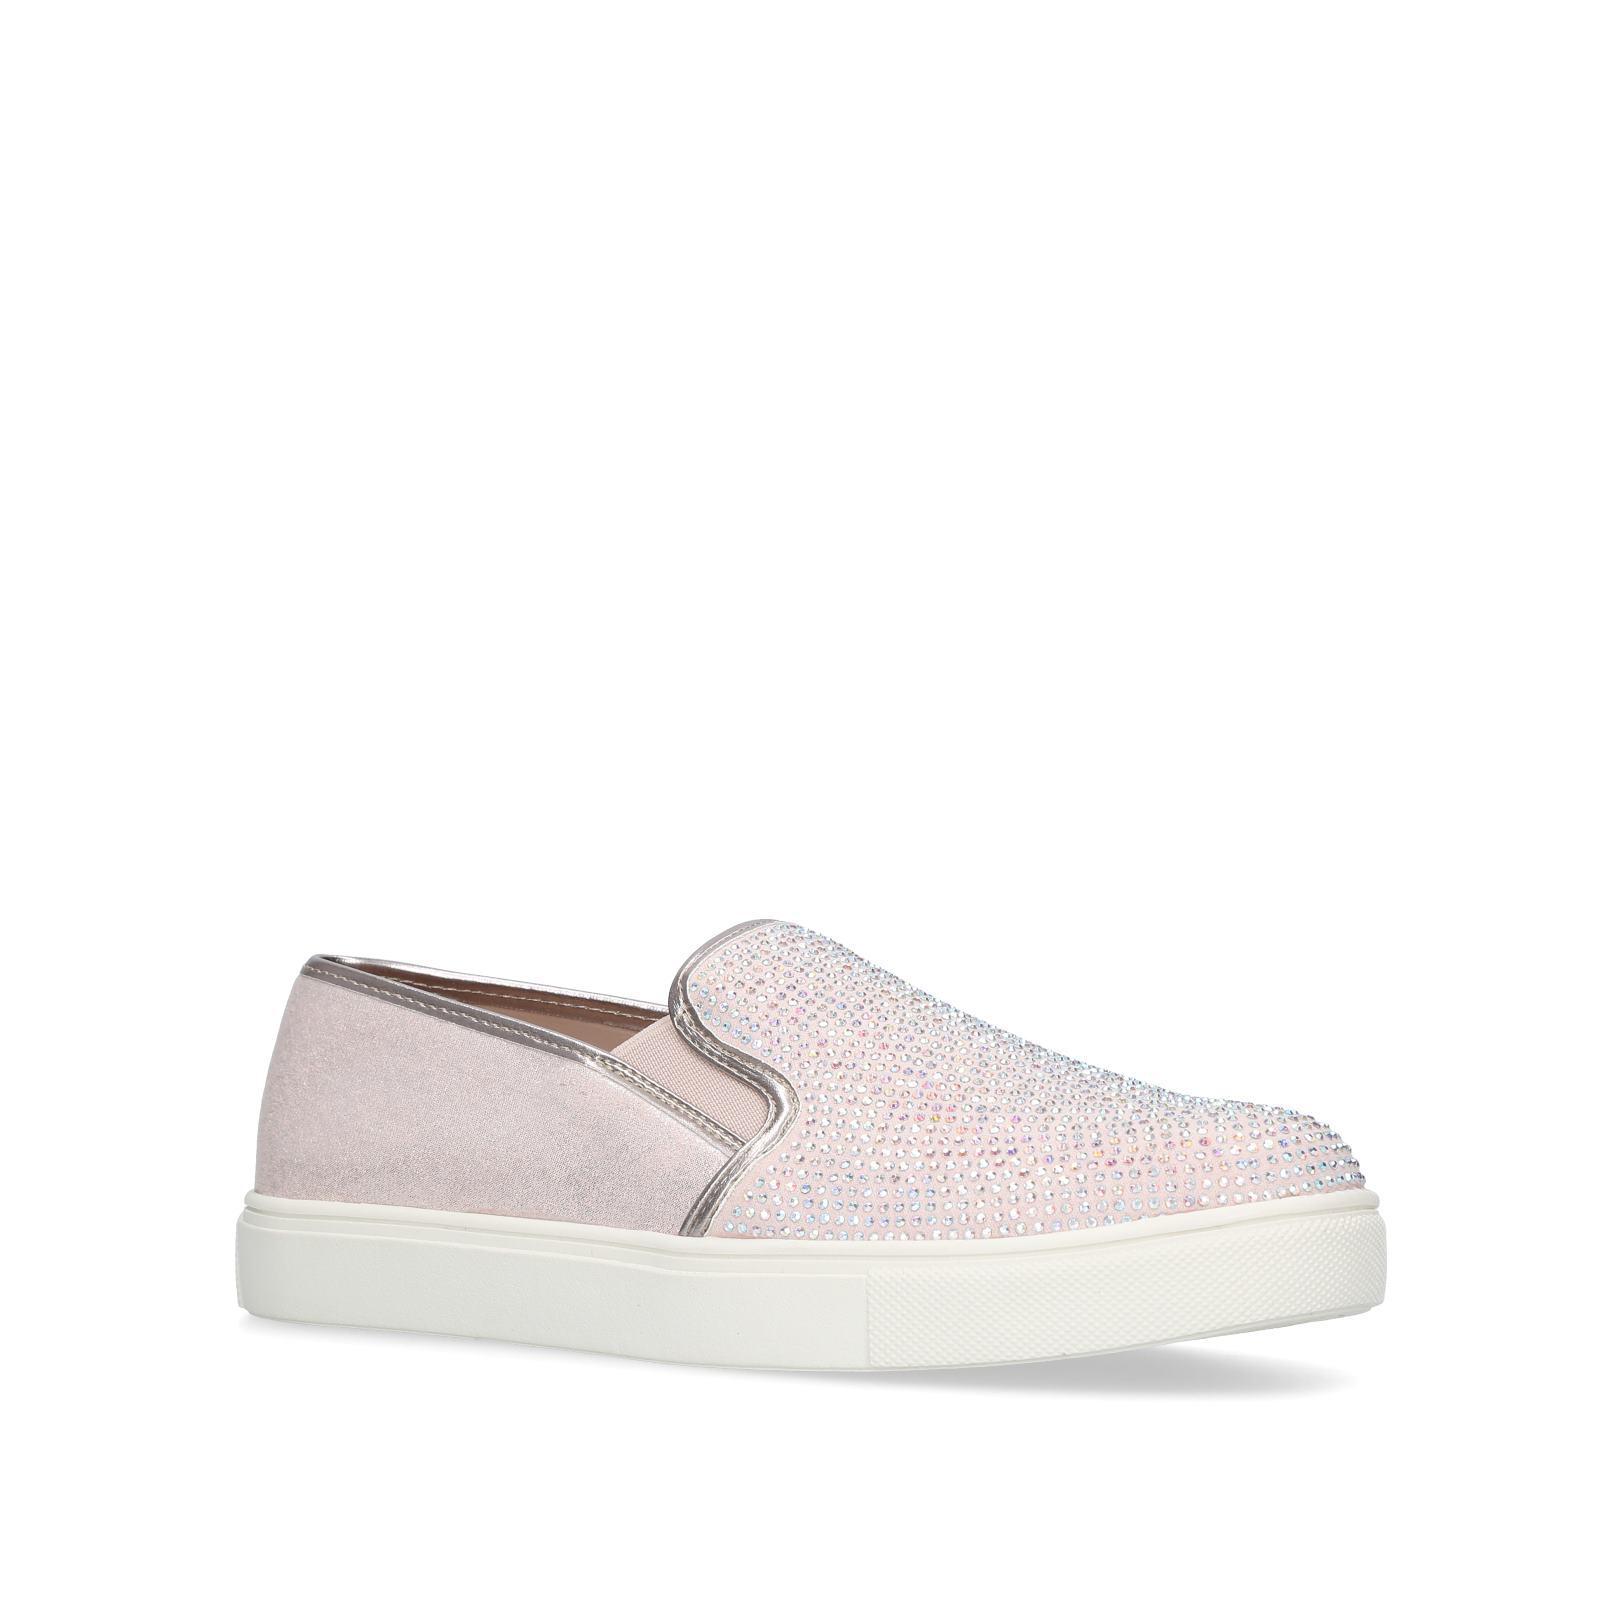 JAMM - CARVELA Sneakers